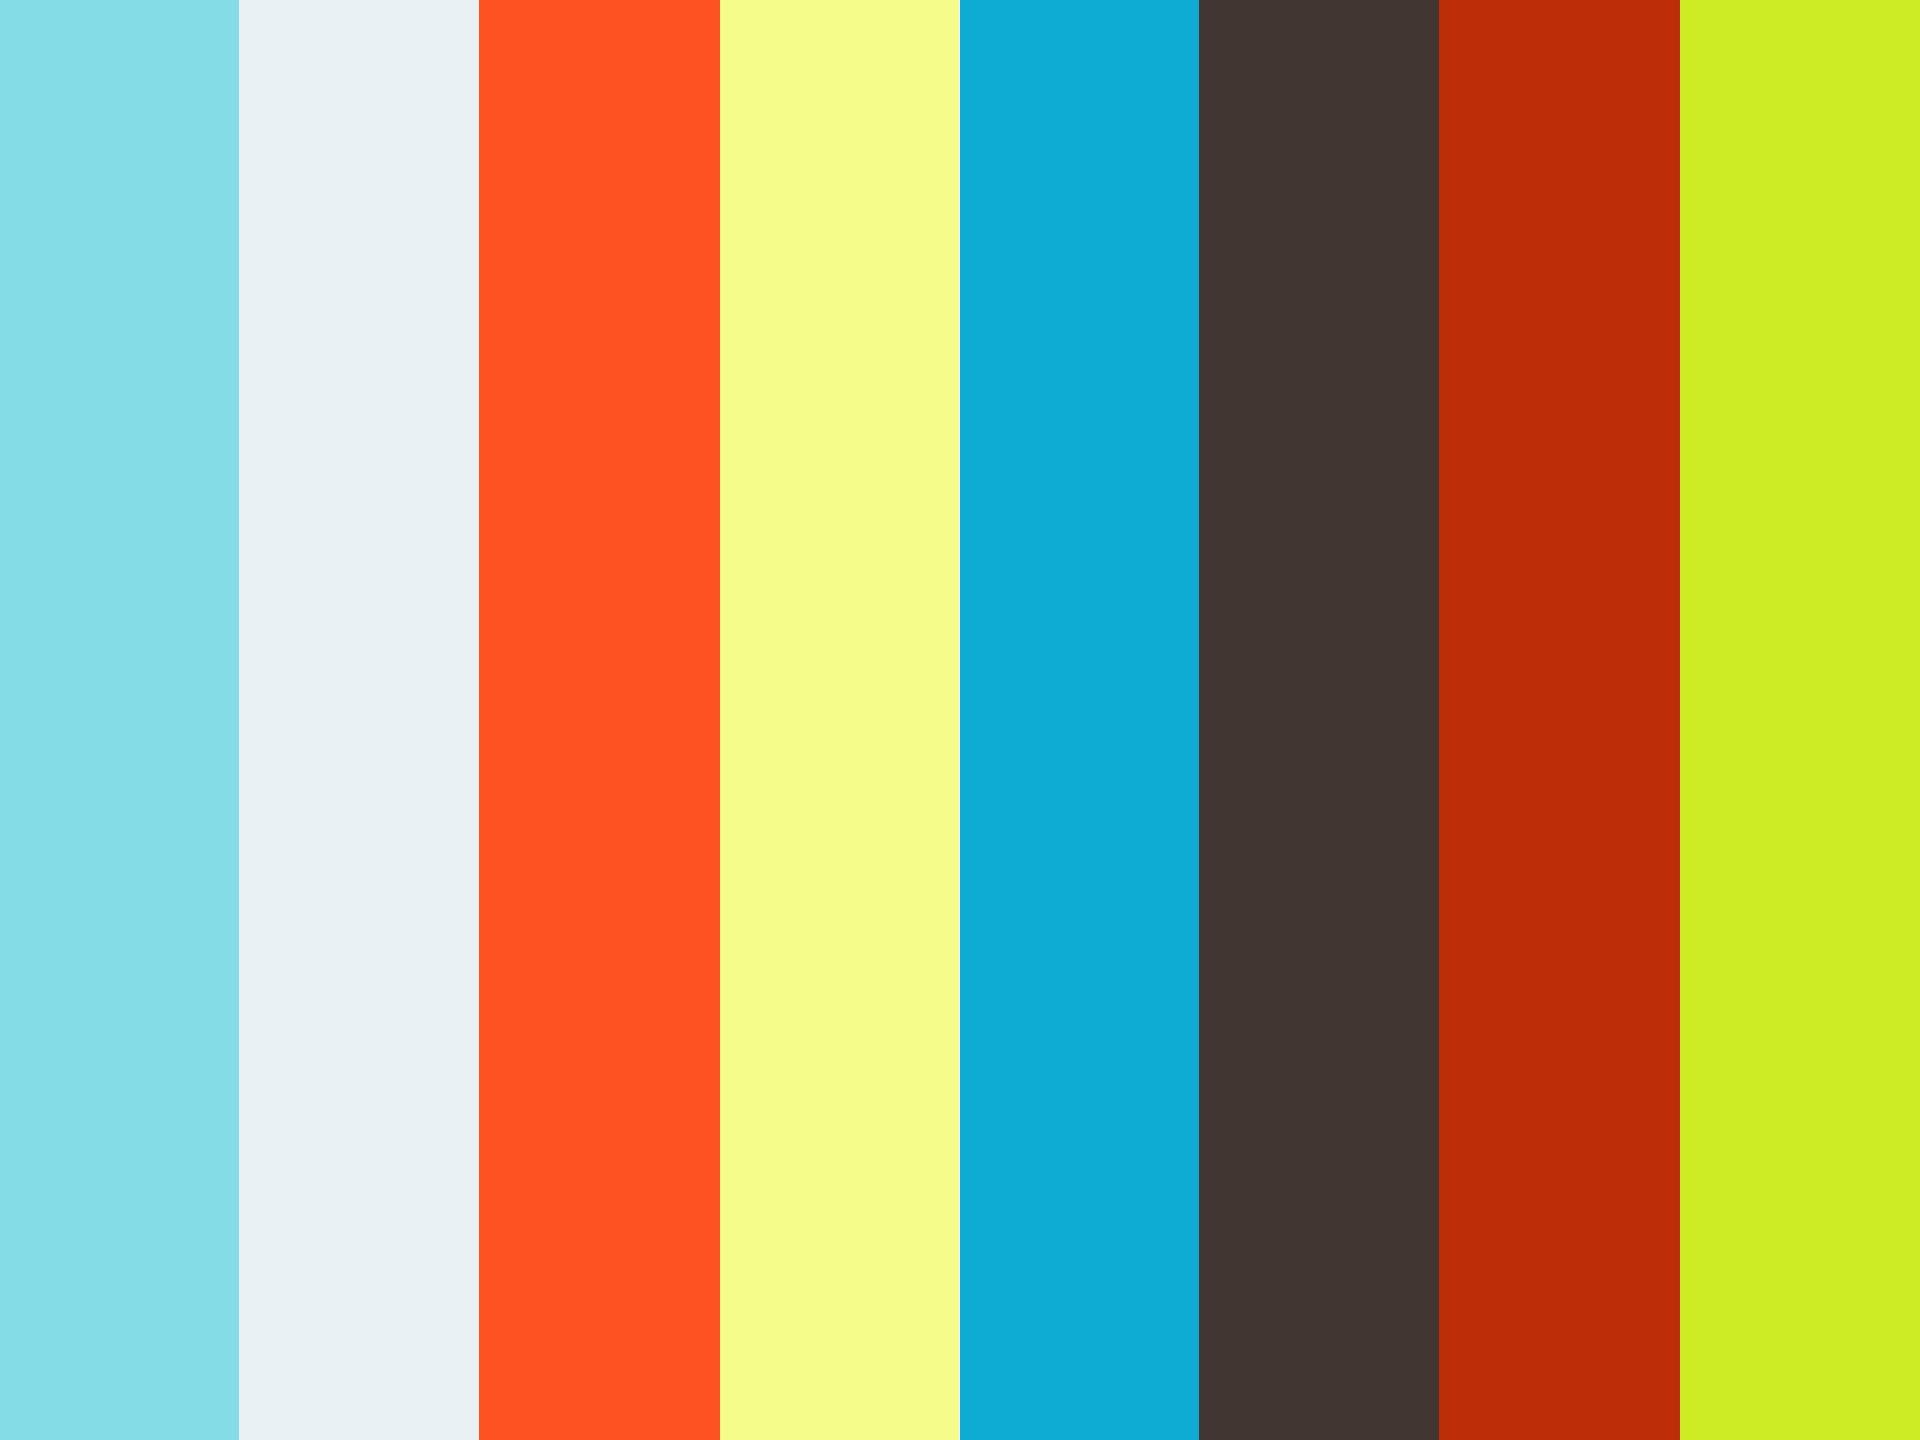 medium resolution of beweeg bewust maastricht sport 2018 on vimeo